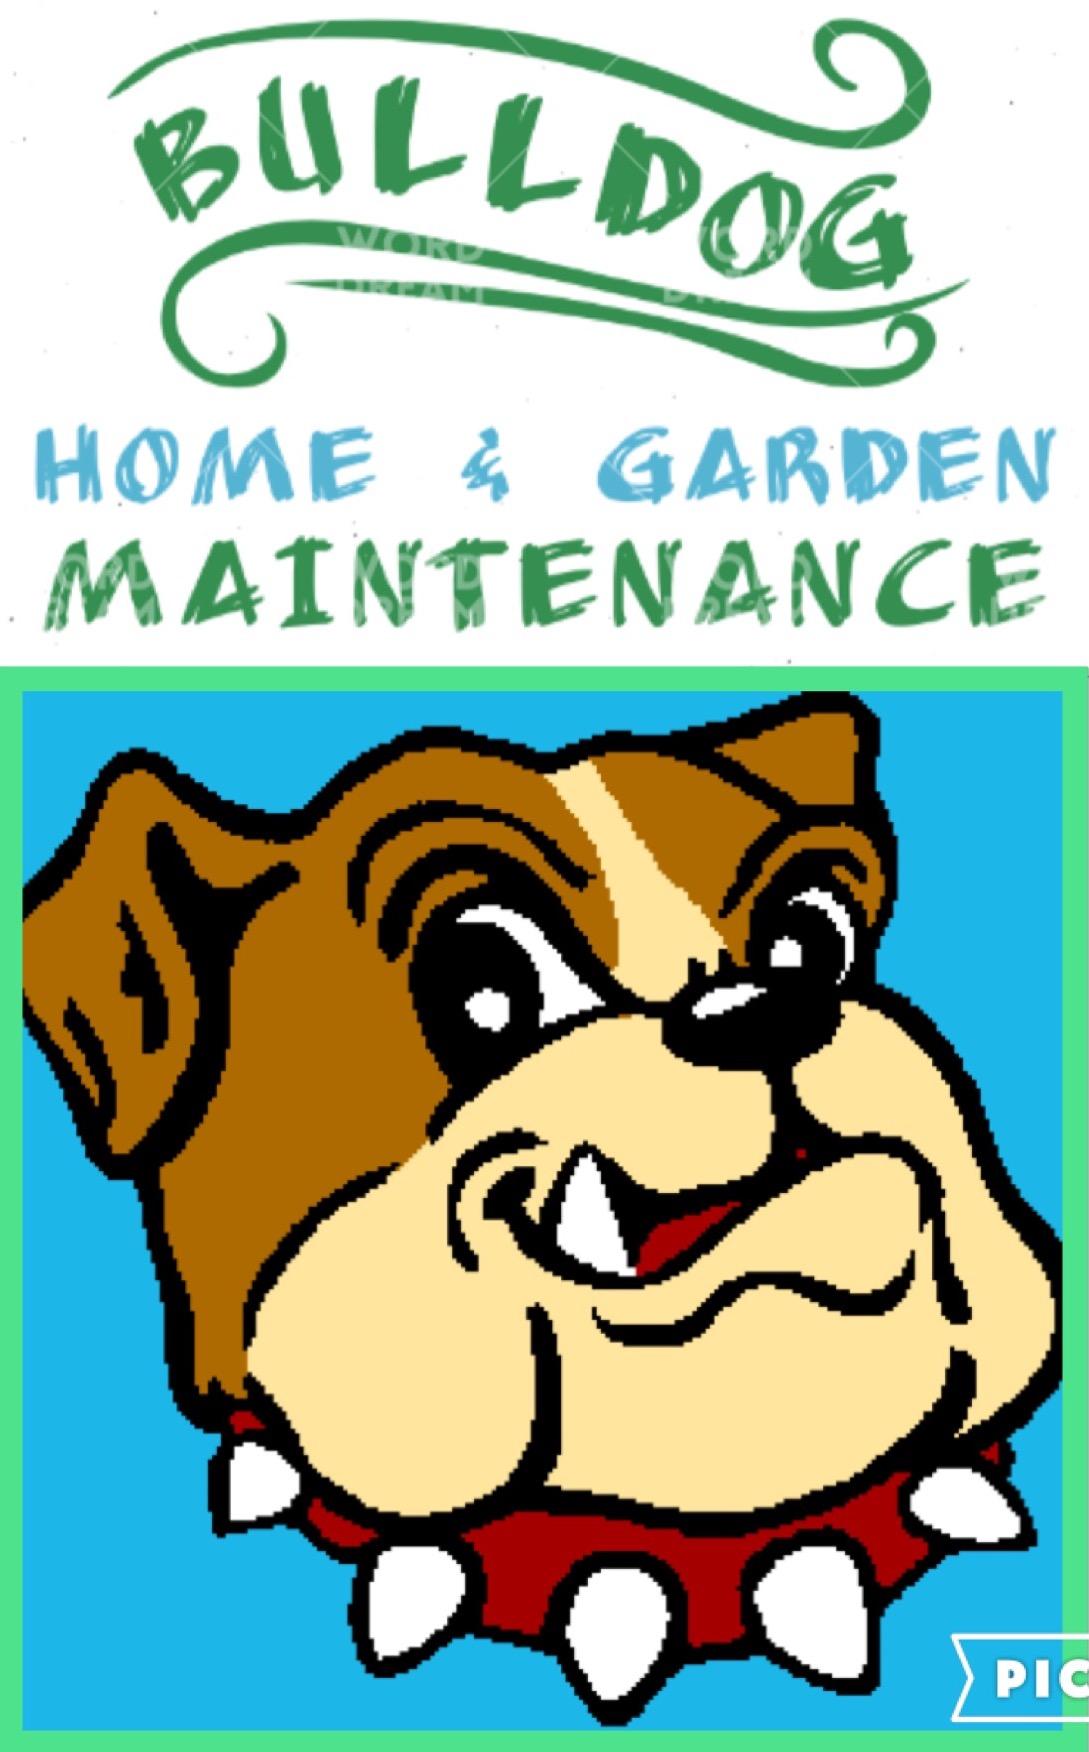 Bulldog Home & Garden Maintenance